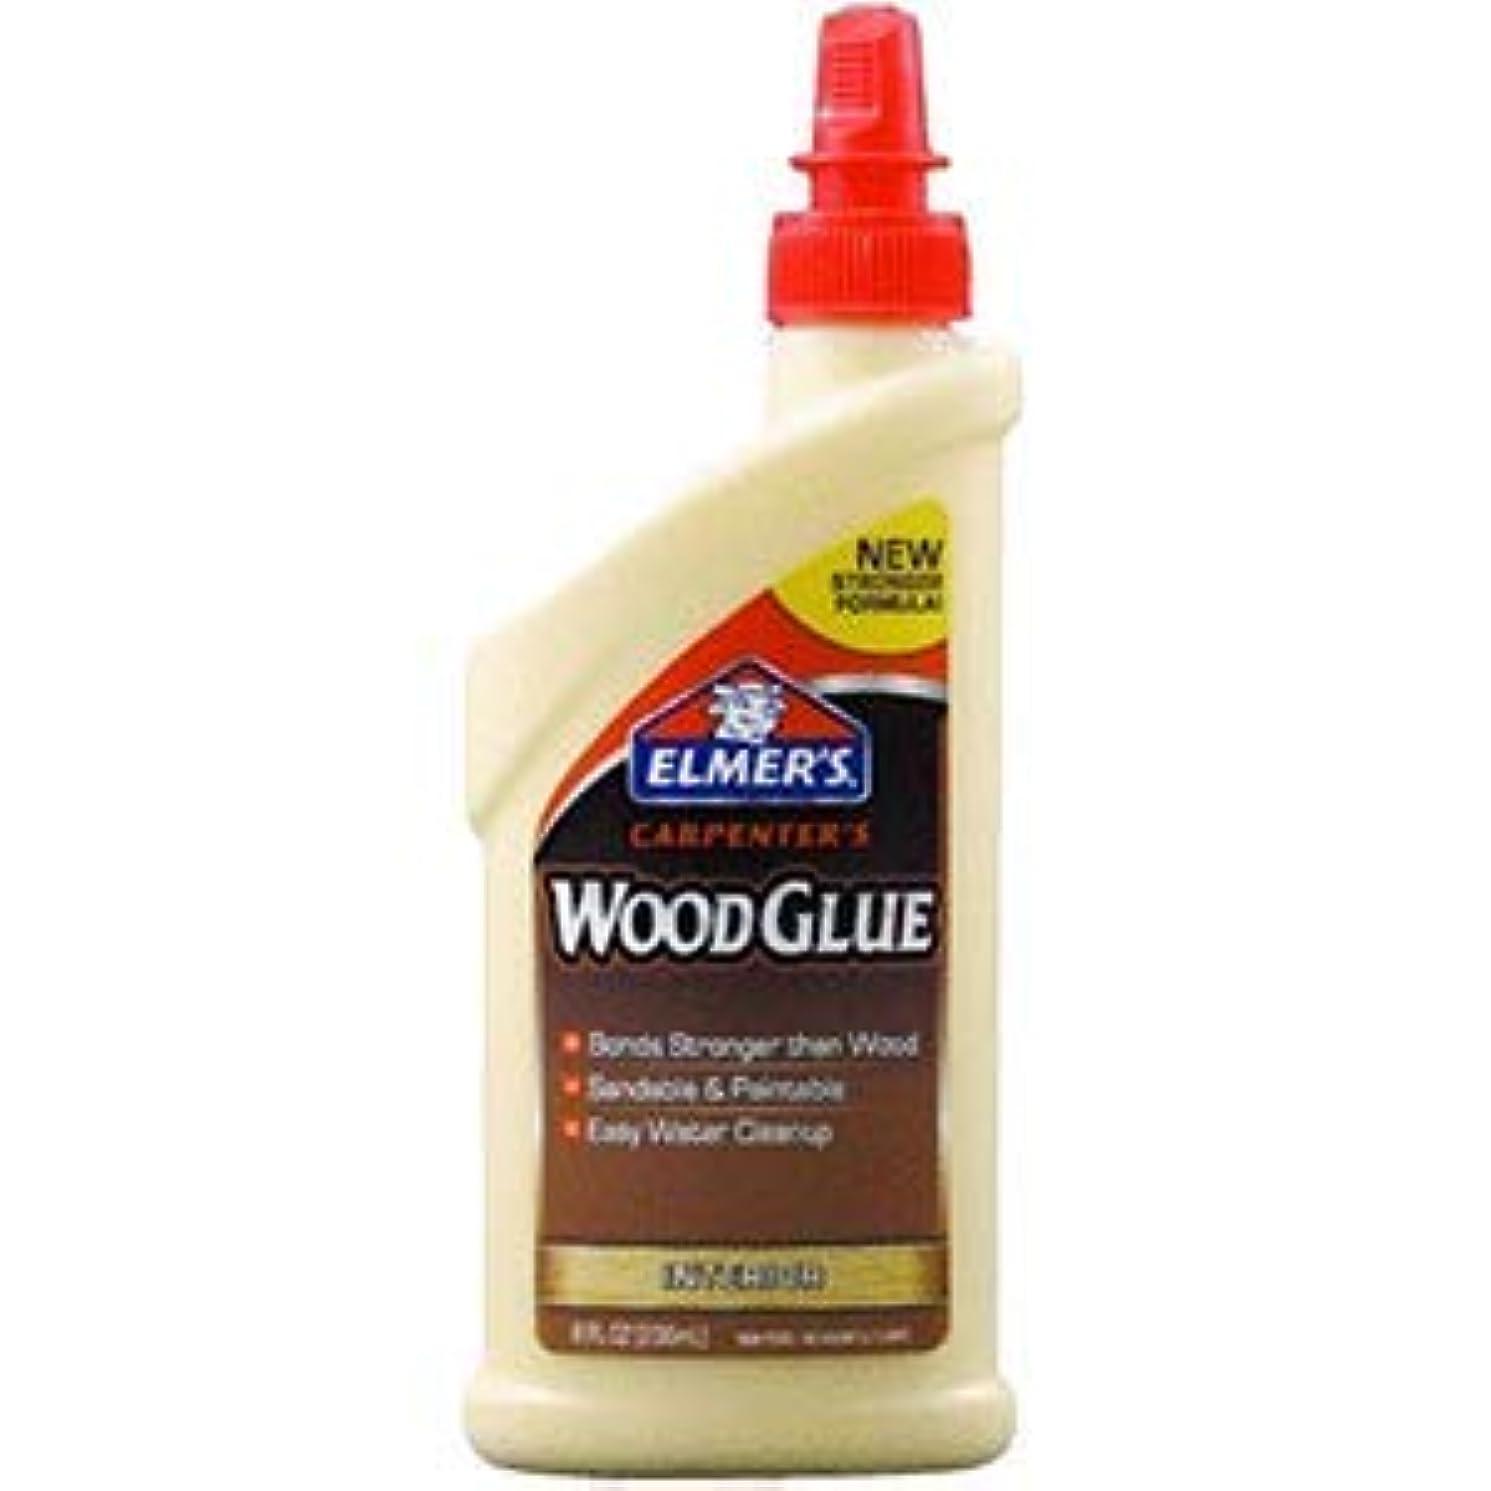 Elmers Products Elmers E7010 8 oz. Carpenters Wood Glue - 12ct. Case